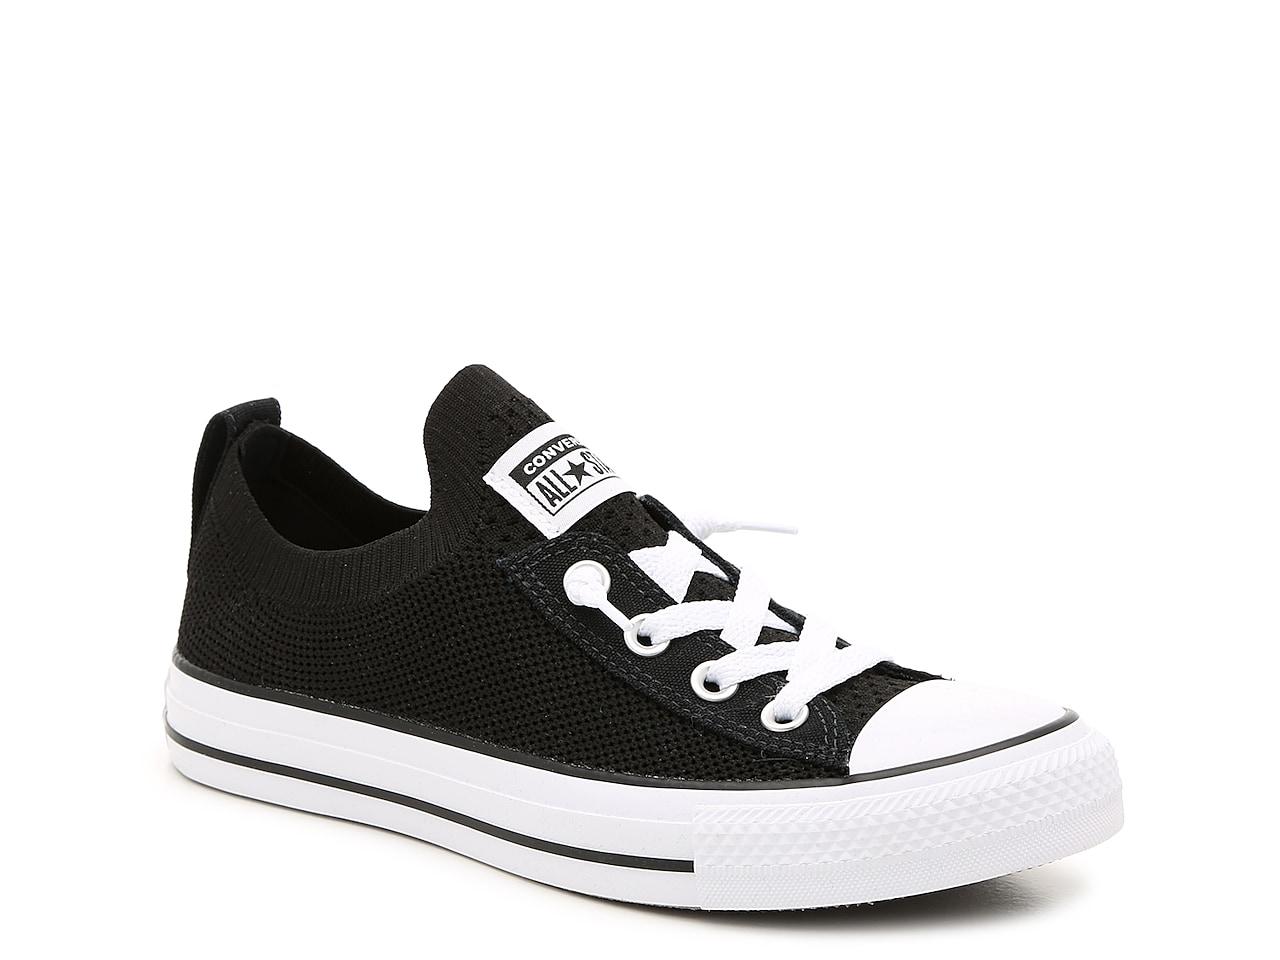 Converse Chuck Taylor All Star Shoreline Knit Slip-On Sneaker - Women's